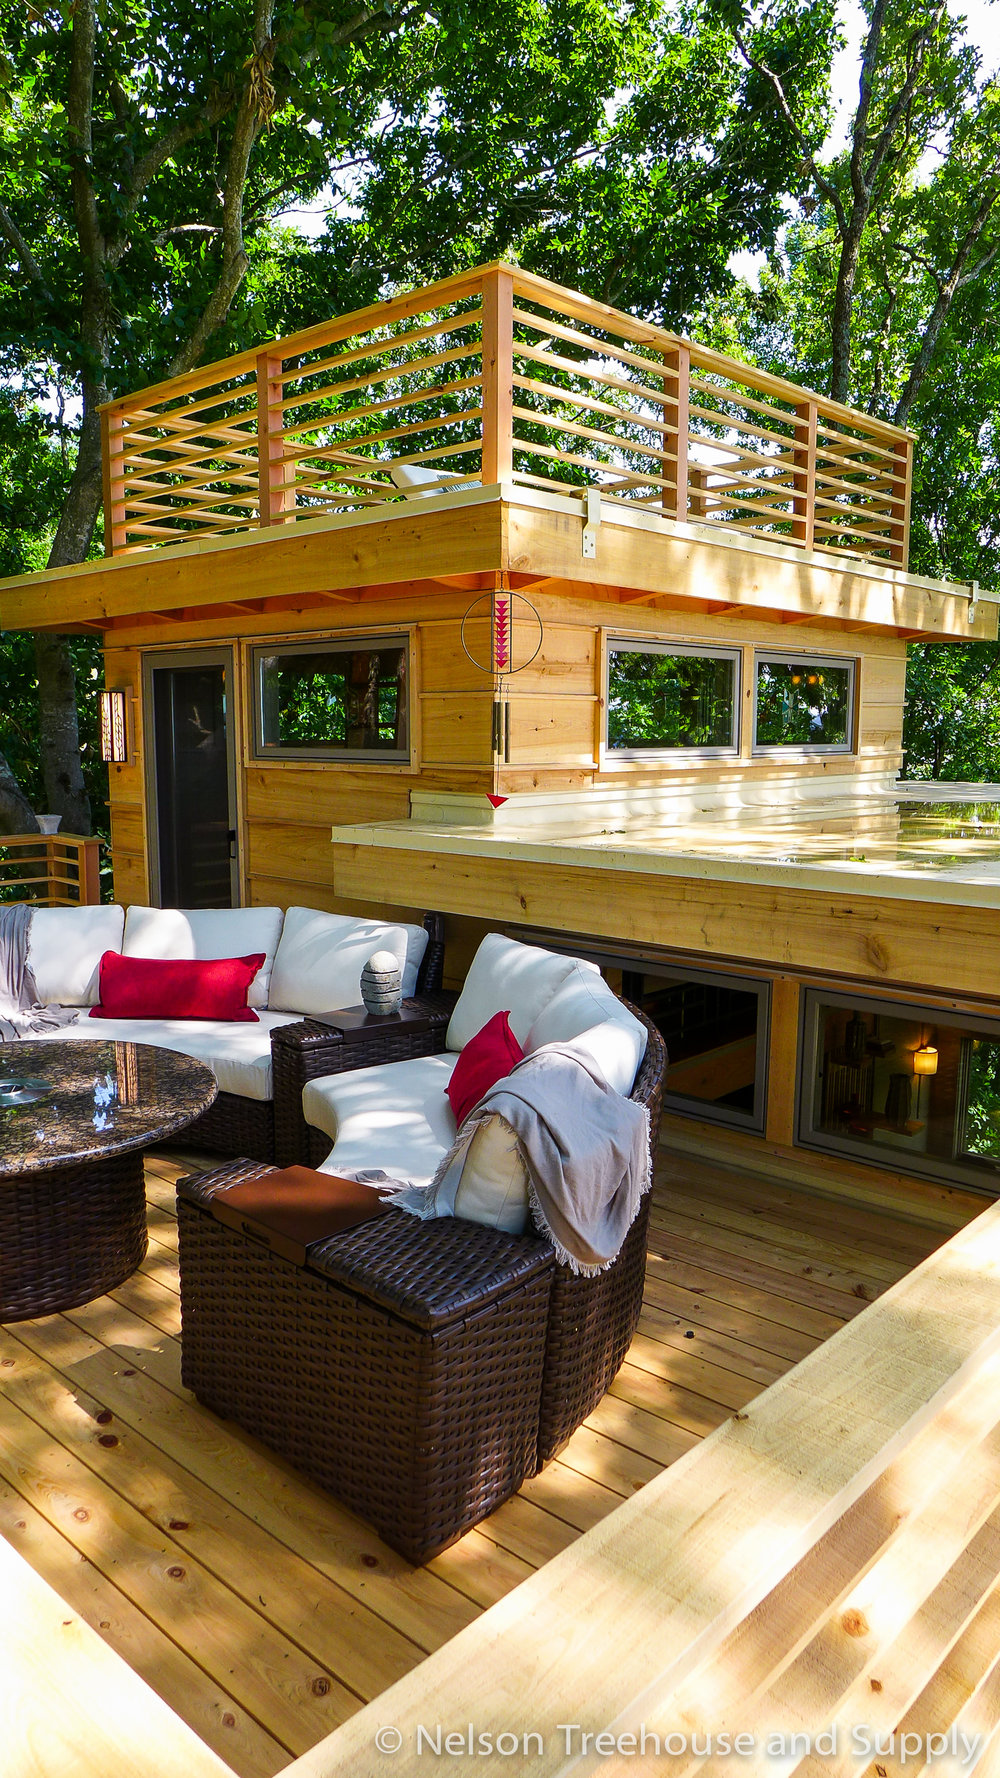 frank-lloyd-wright-treehouse-sun-roof-1